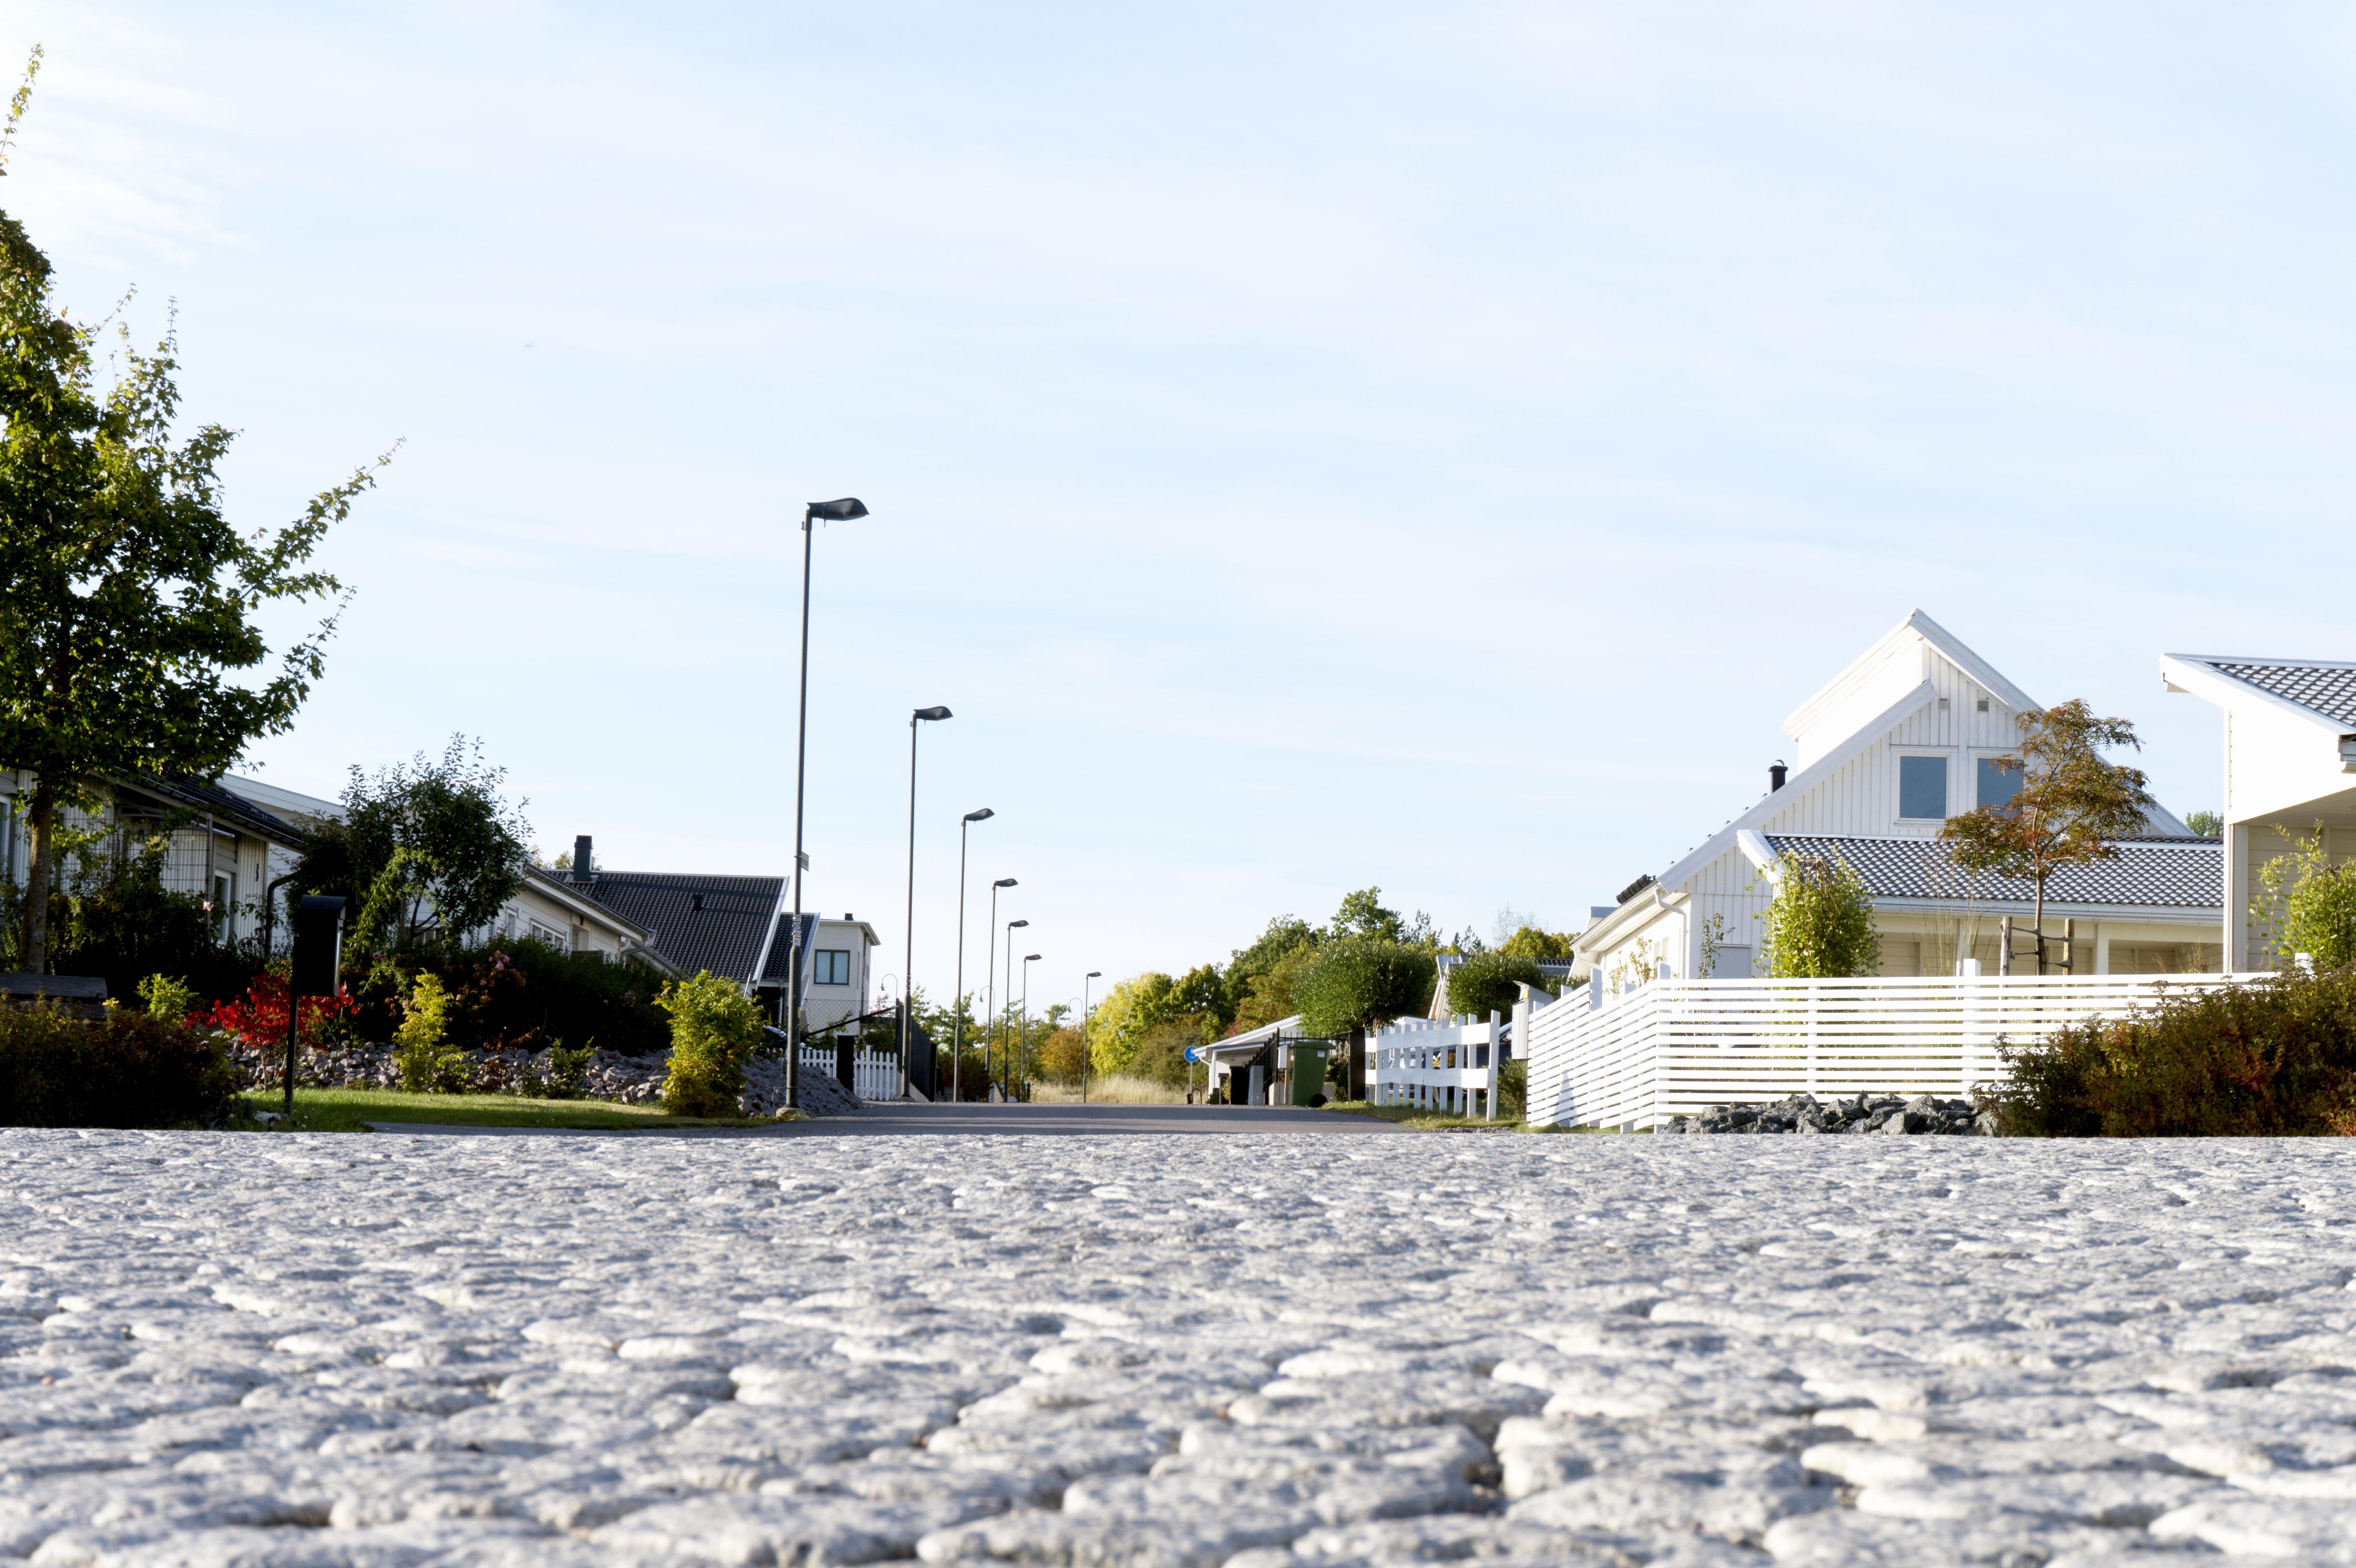 street1a